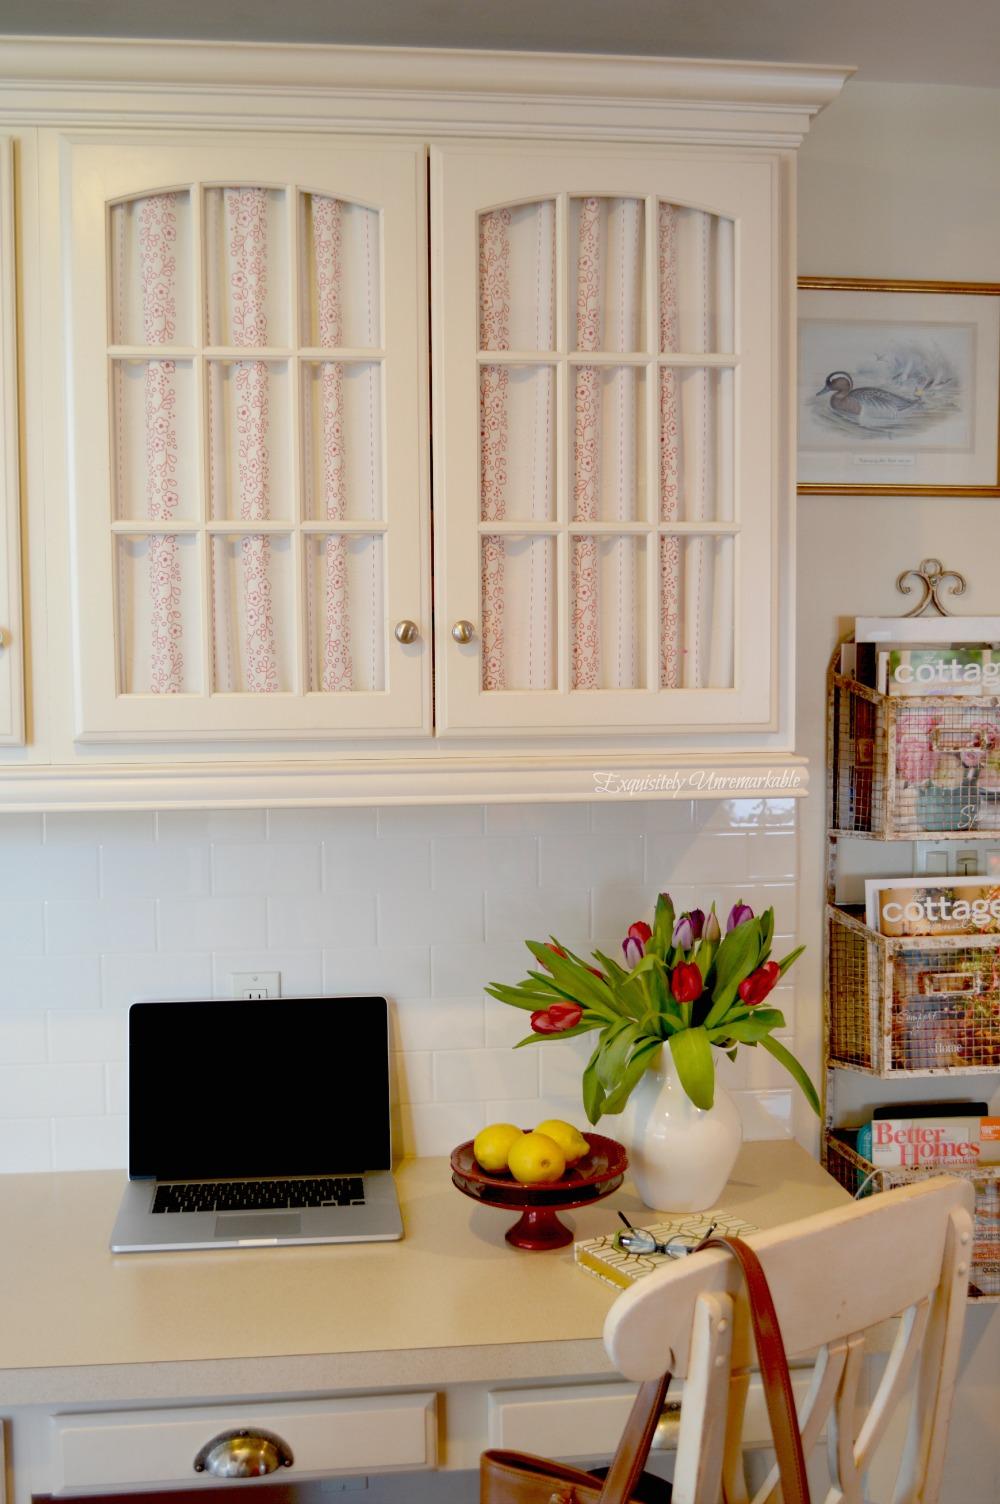 Cottage Style Kitchen Desk Decor Ideas